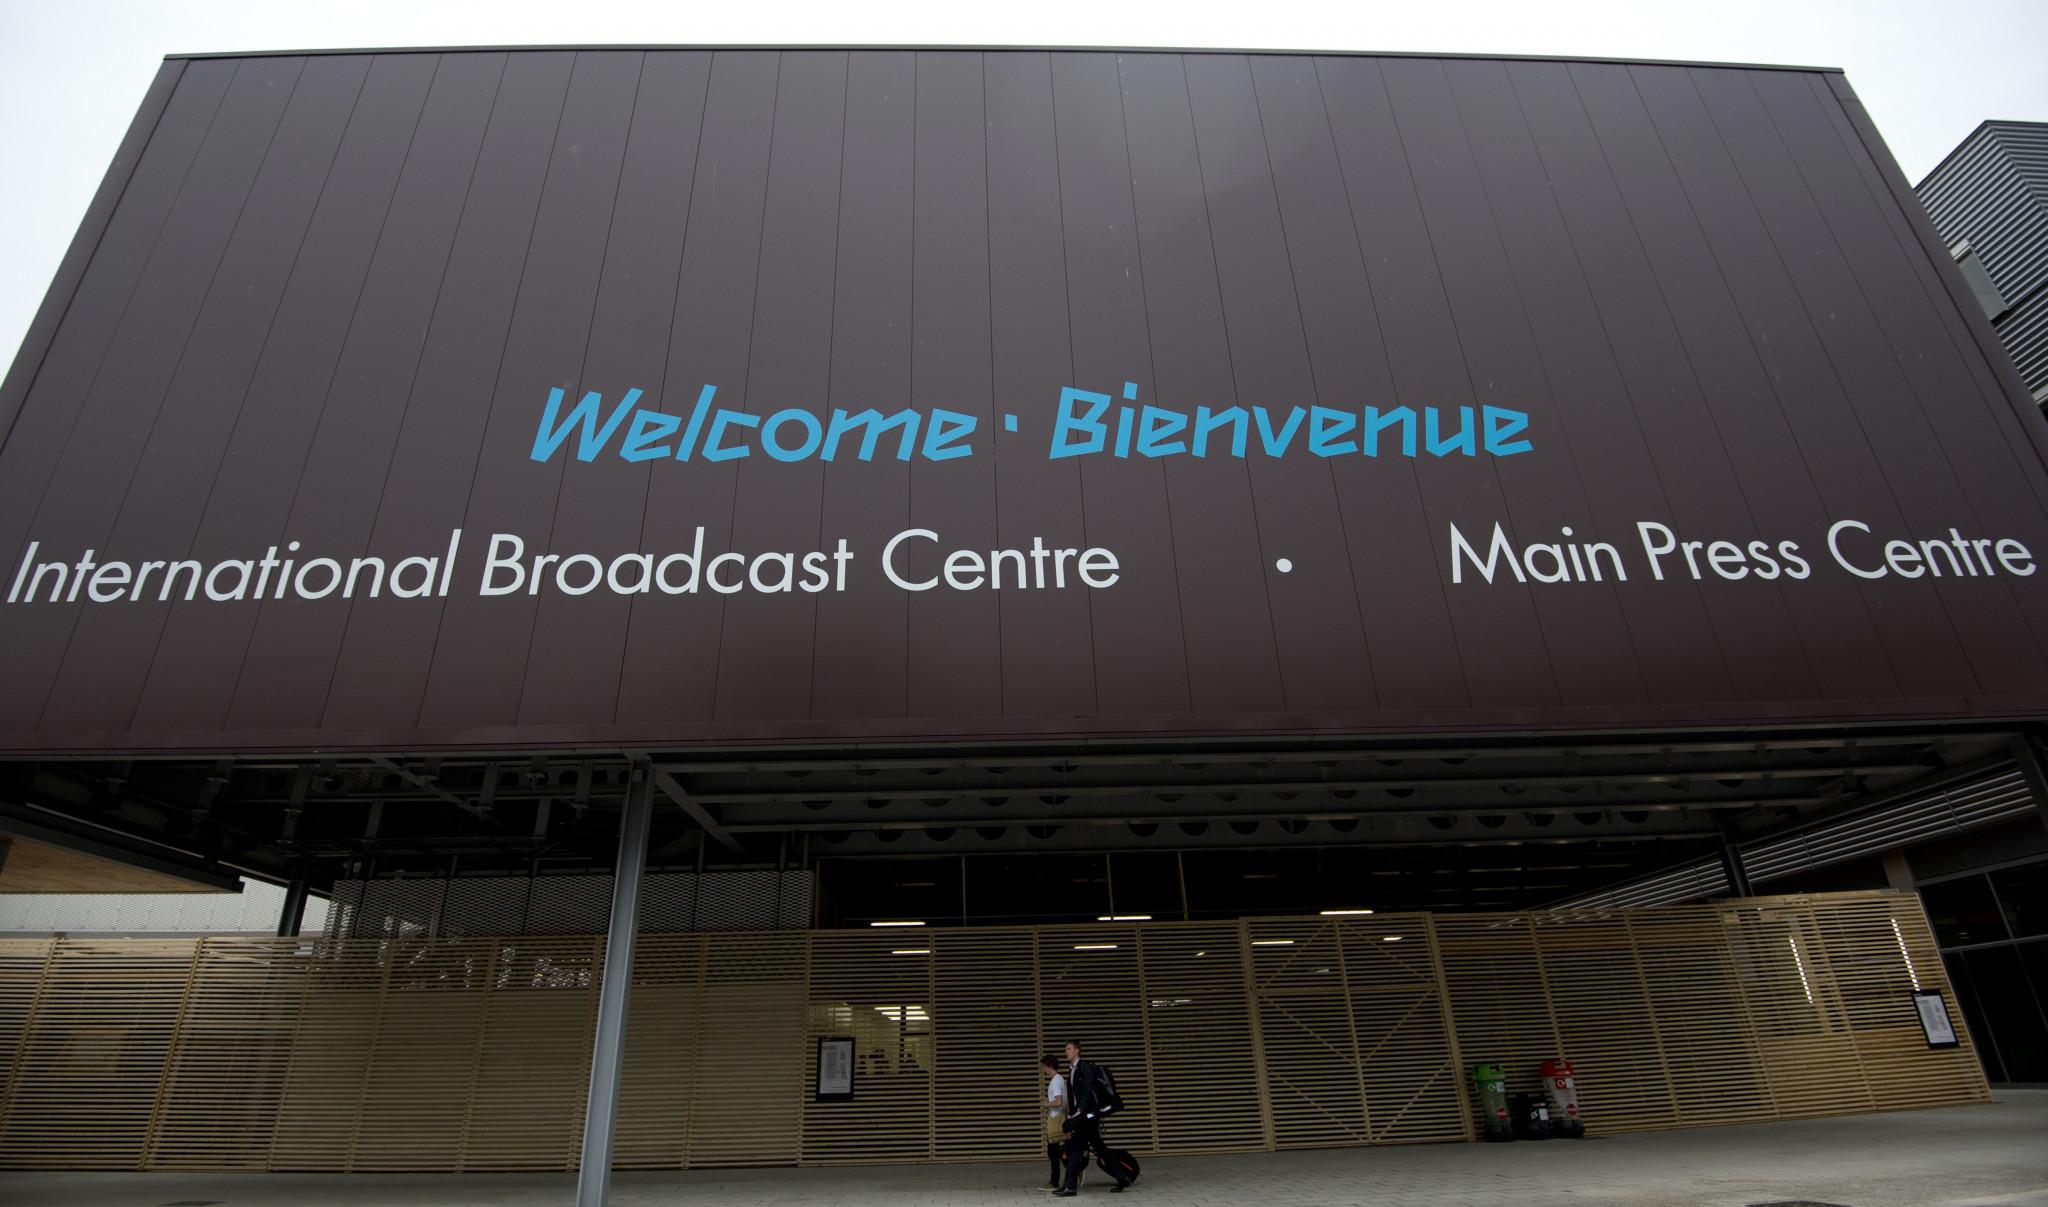 IOC publish video highlighting legacy of London 2012 International Broadcast Centre